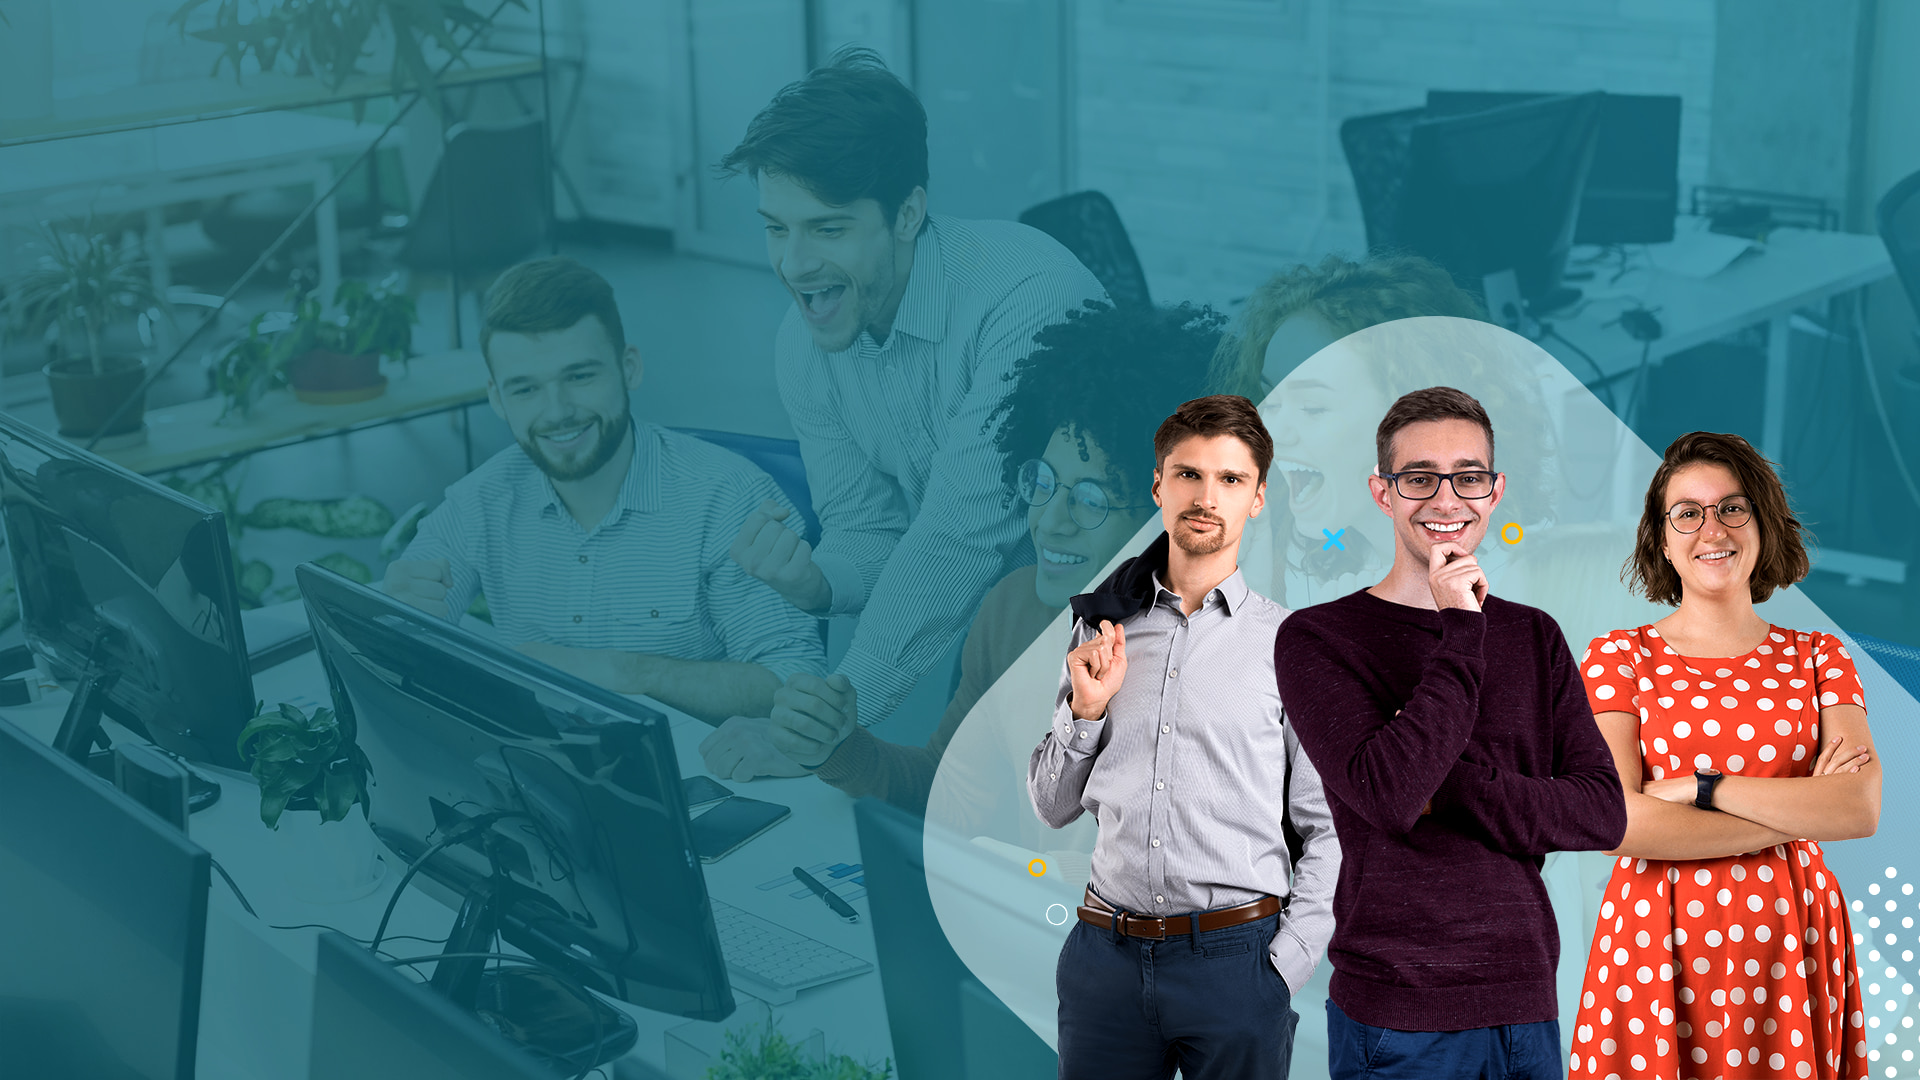 Collaboration Software Development Team